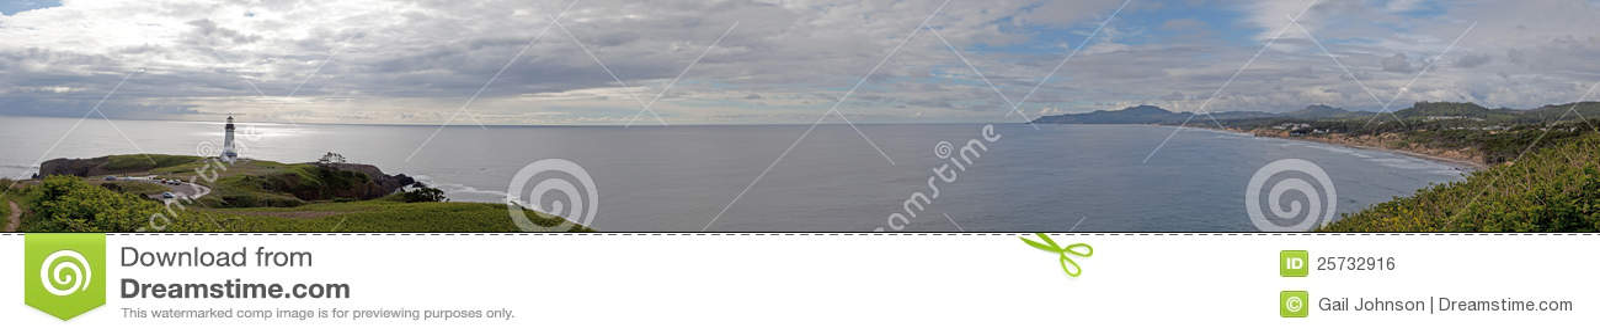 Yacquina Lighthouse panorama